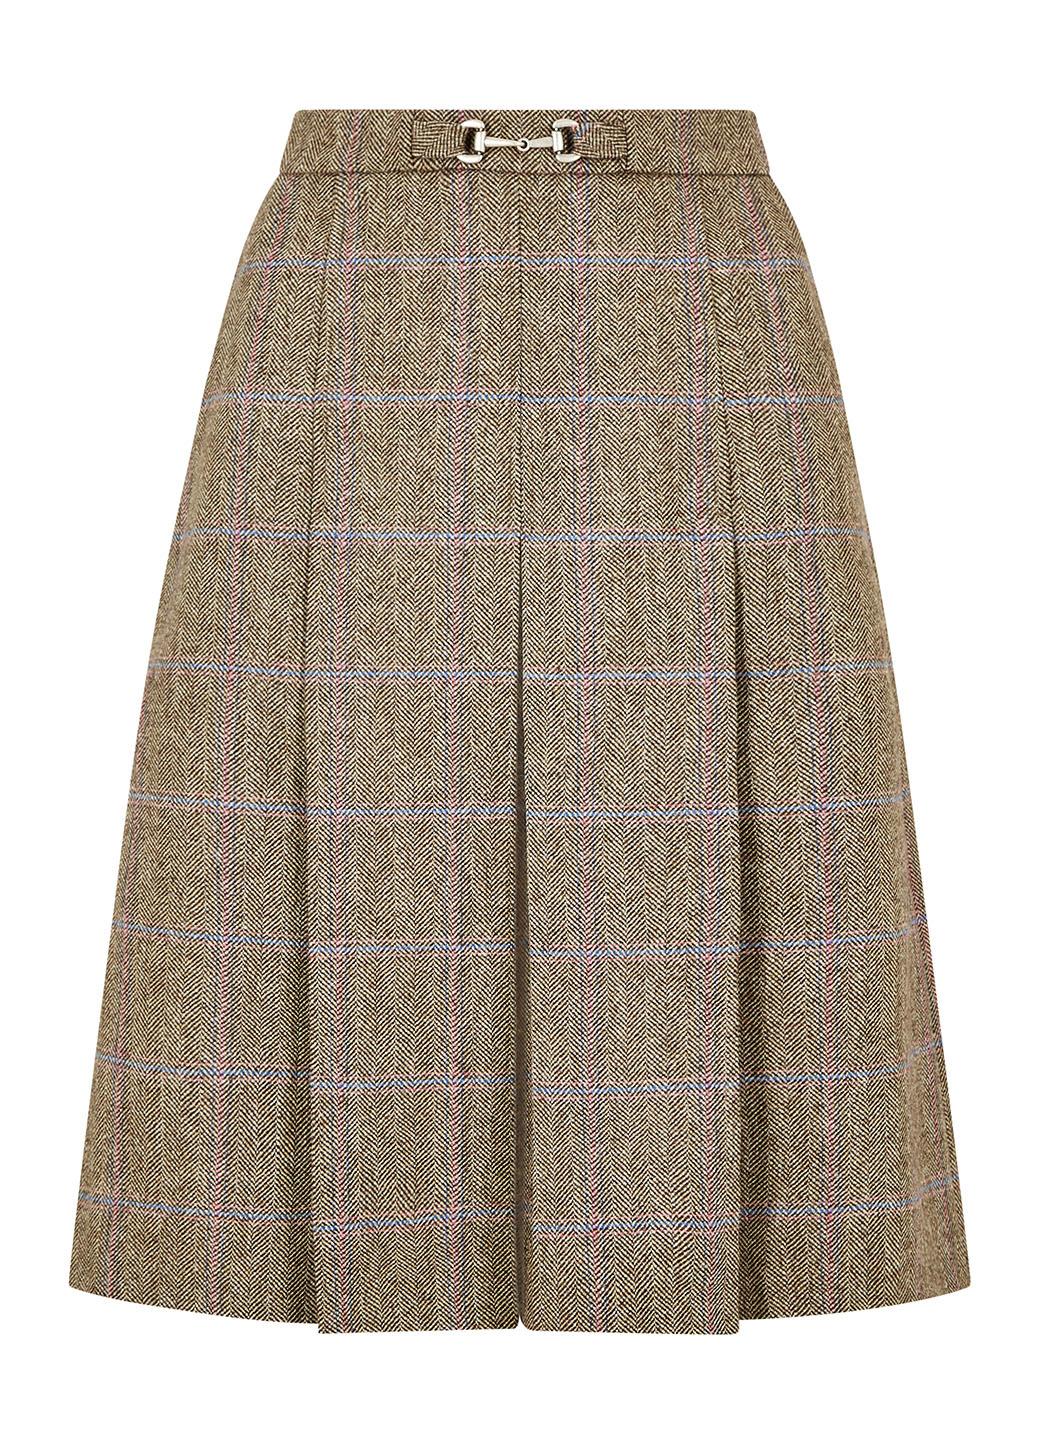 Dubarry Spruce Tweed Rok - Woodrose-1